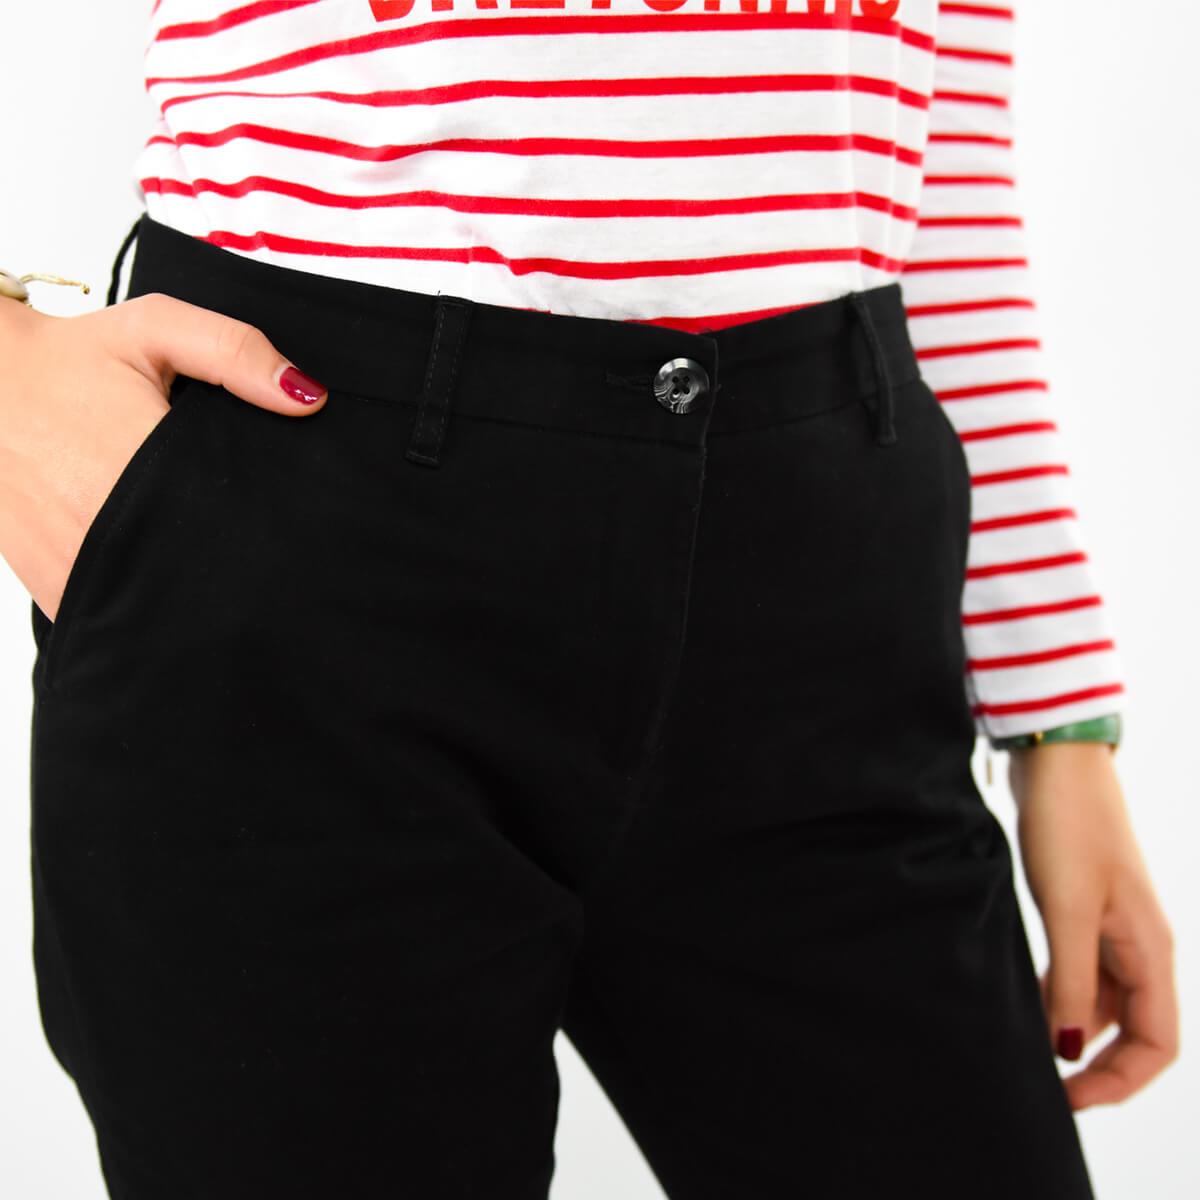 Pantalon chino femme noir zoom face